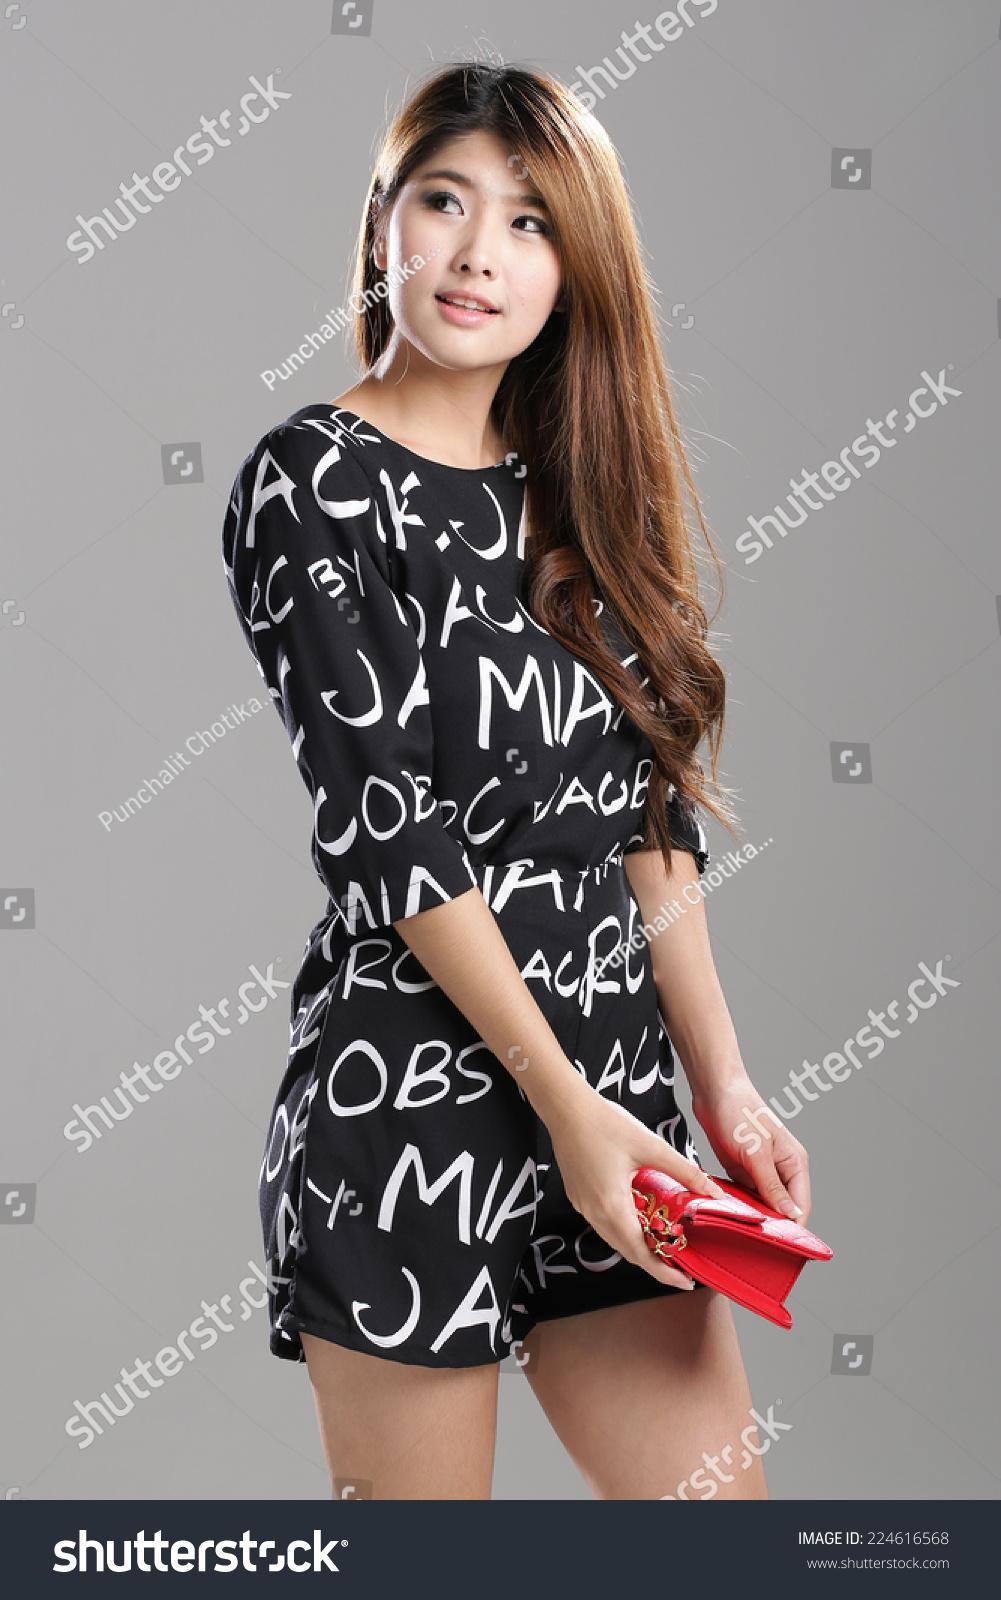 Alphabet images black and white dress